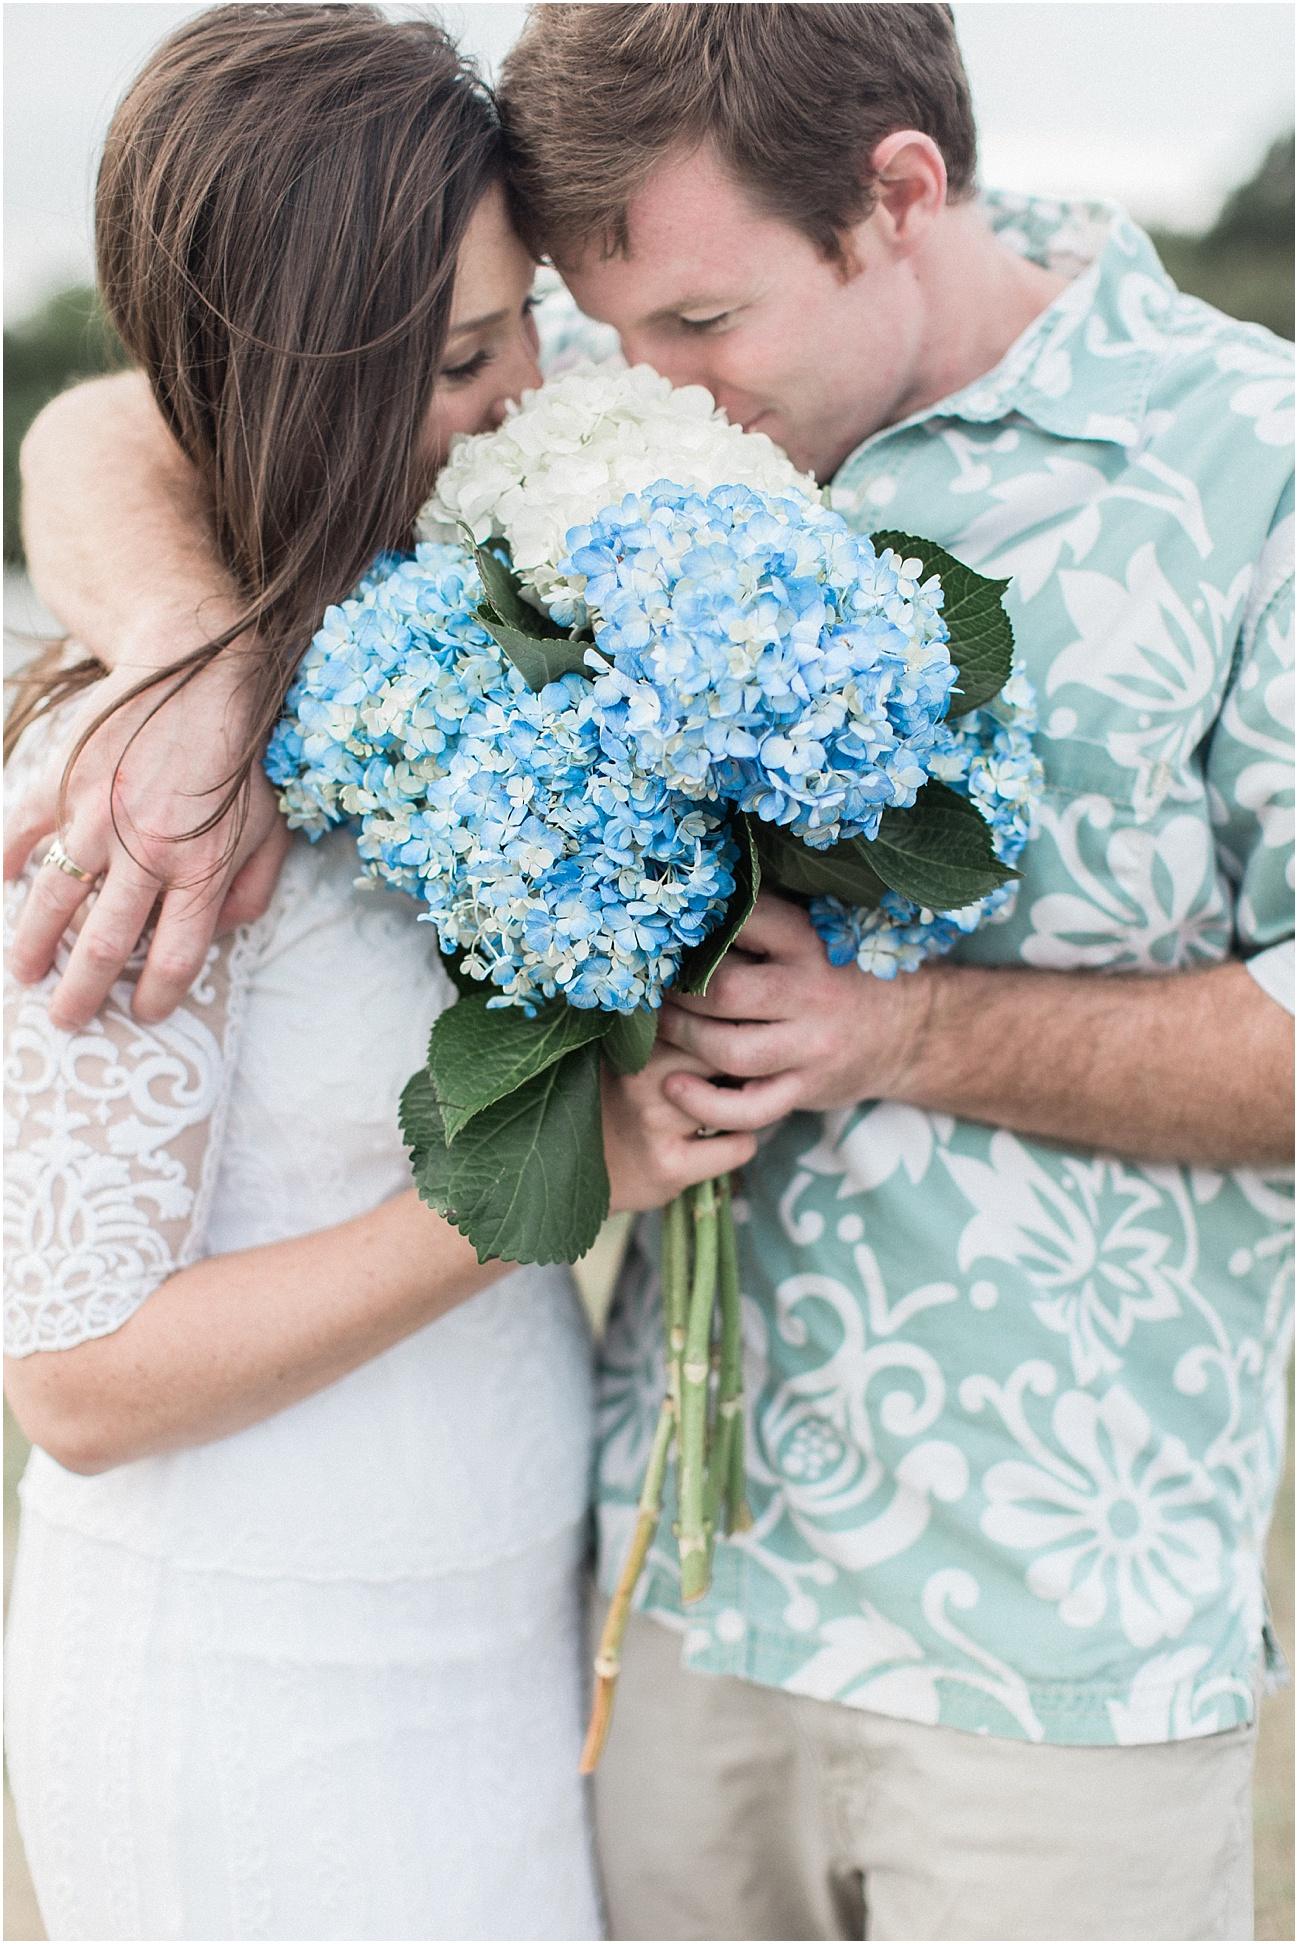 rosie_ryan_nobska_light_house_engagement_cape_cod_boston_wedding_photographer_meredith_jane_photography_photo_1080.jpg